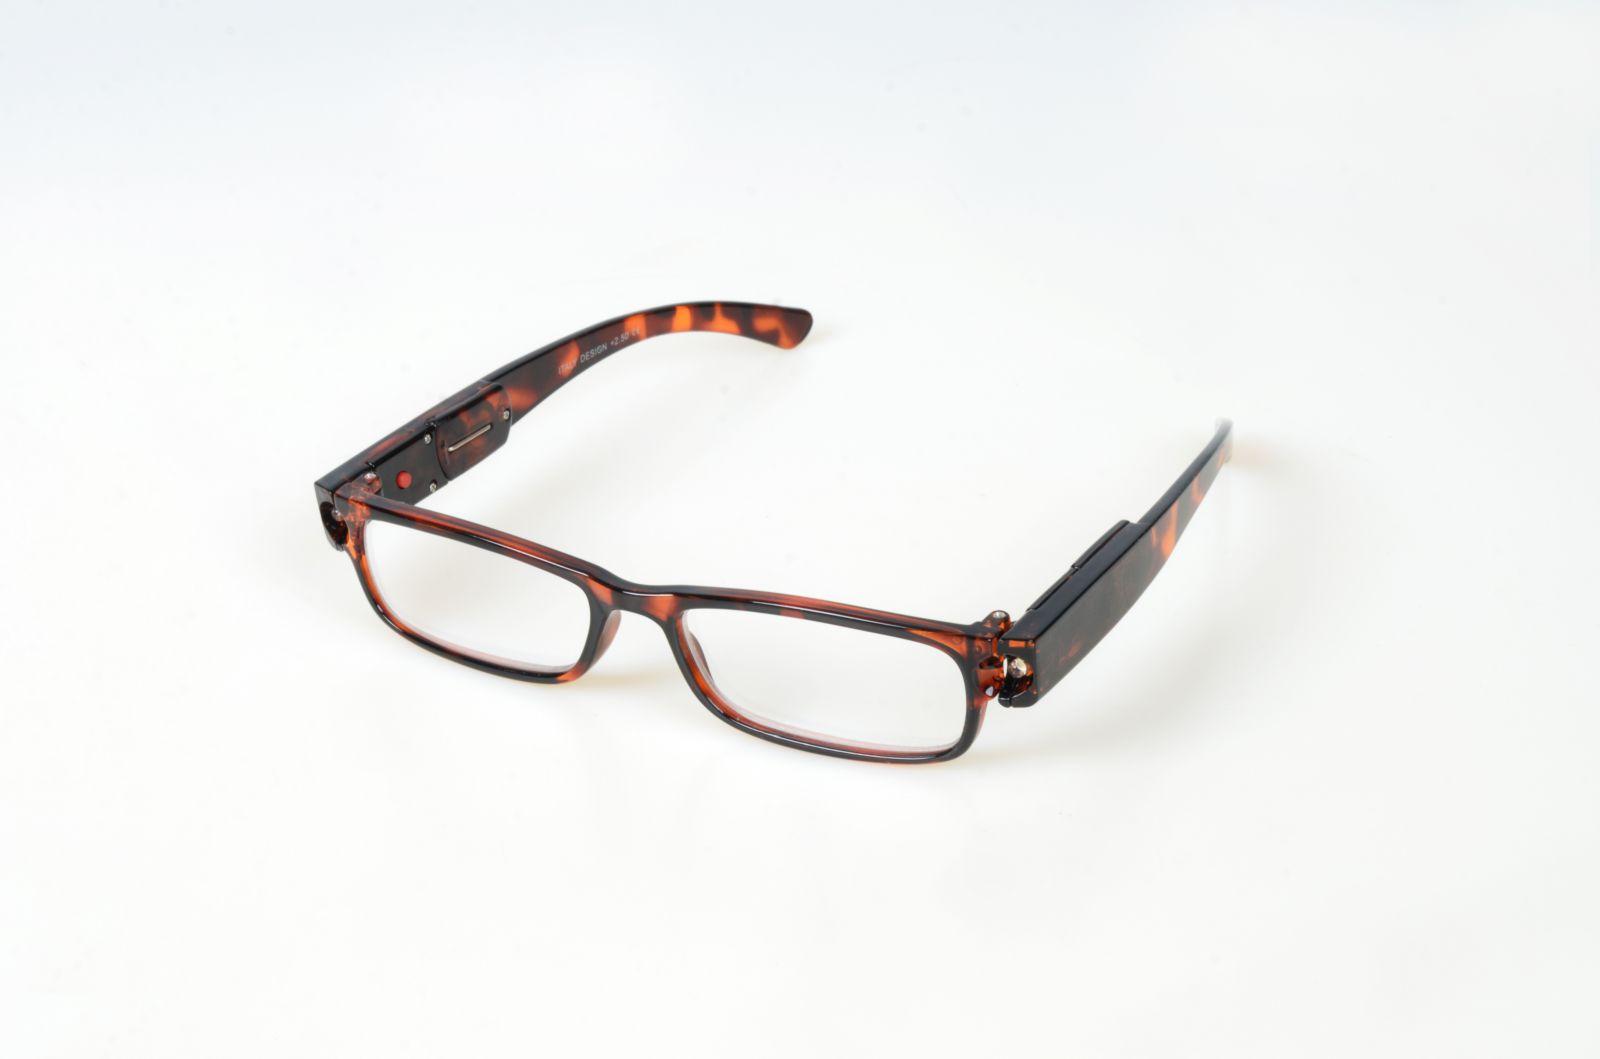 Dioptrické brýle se světýlkama